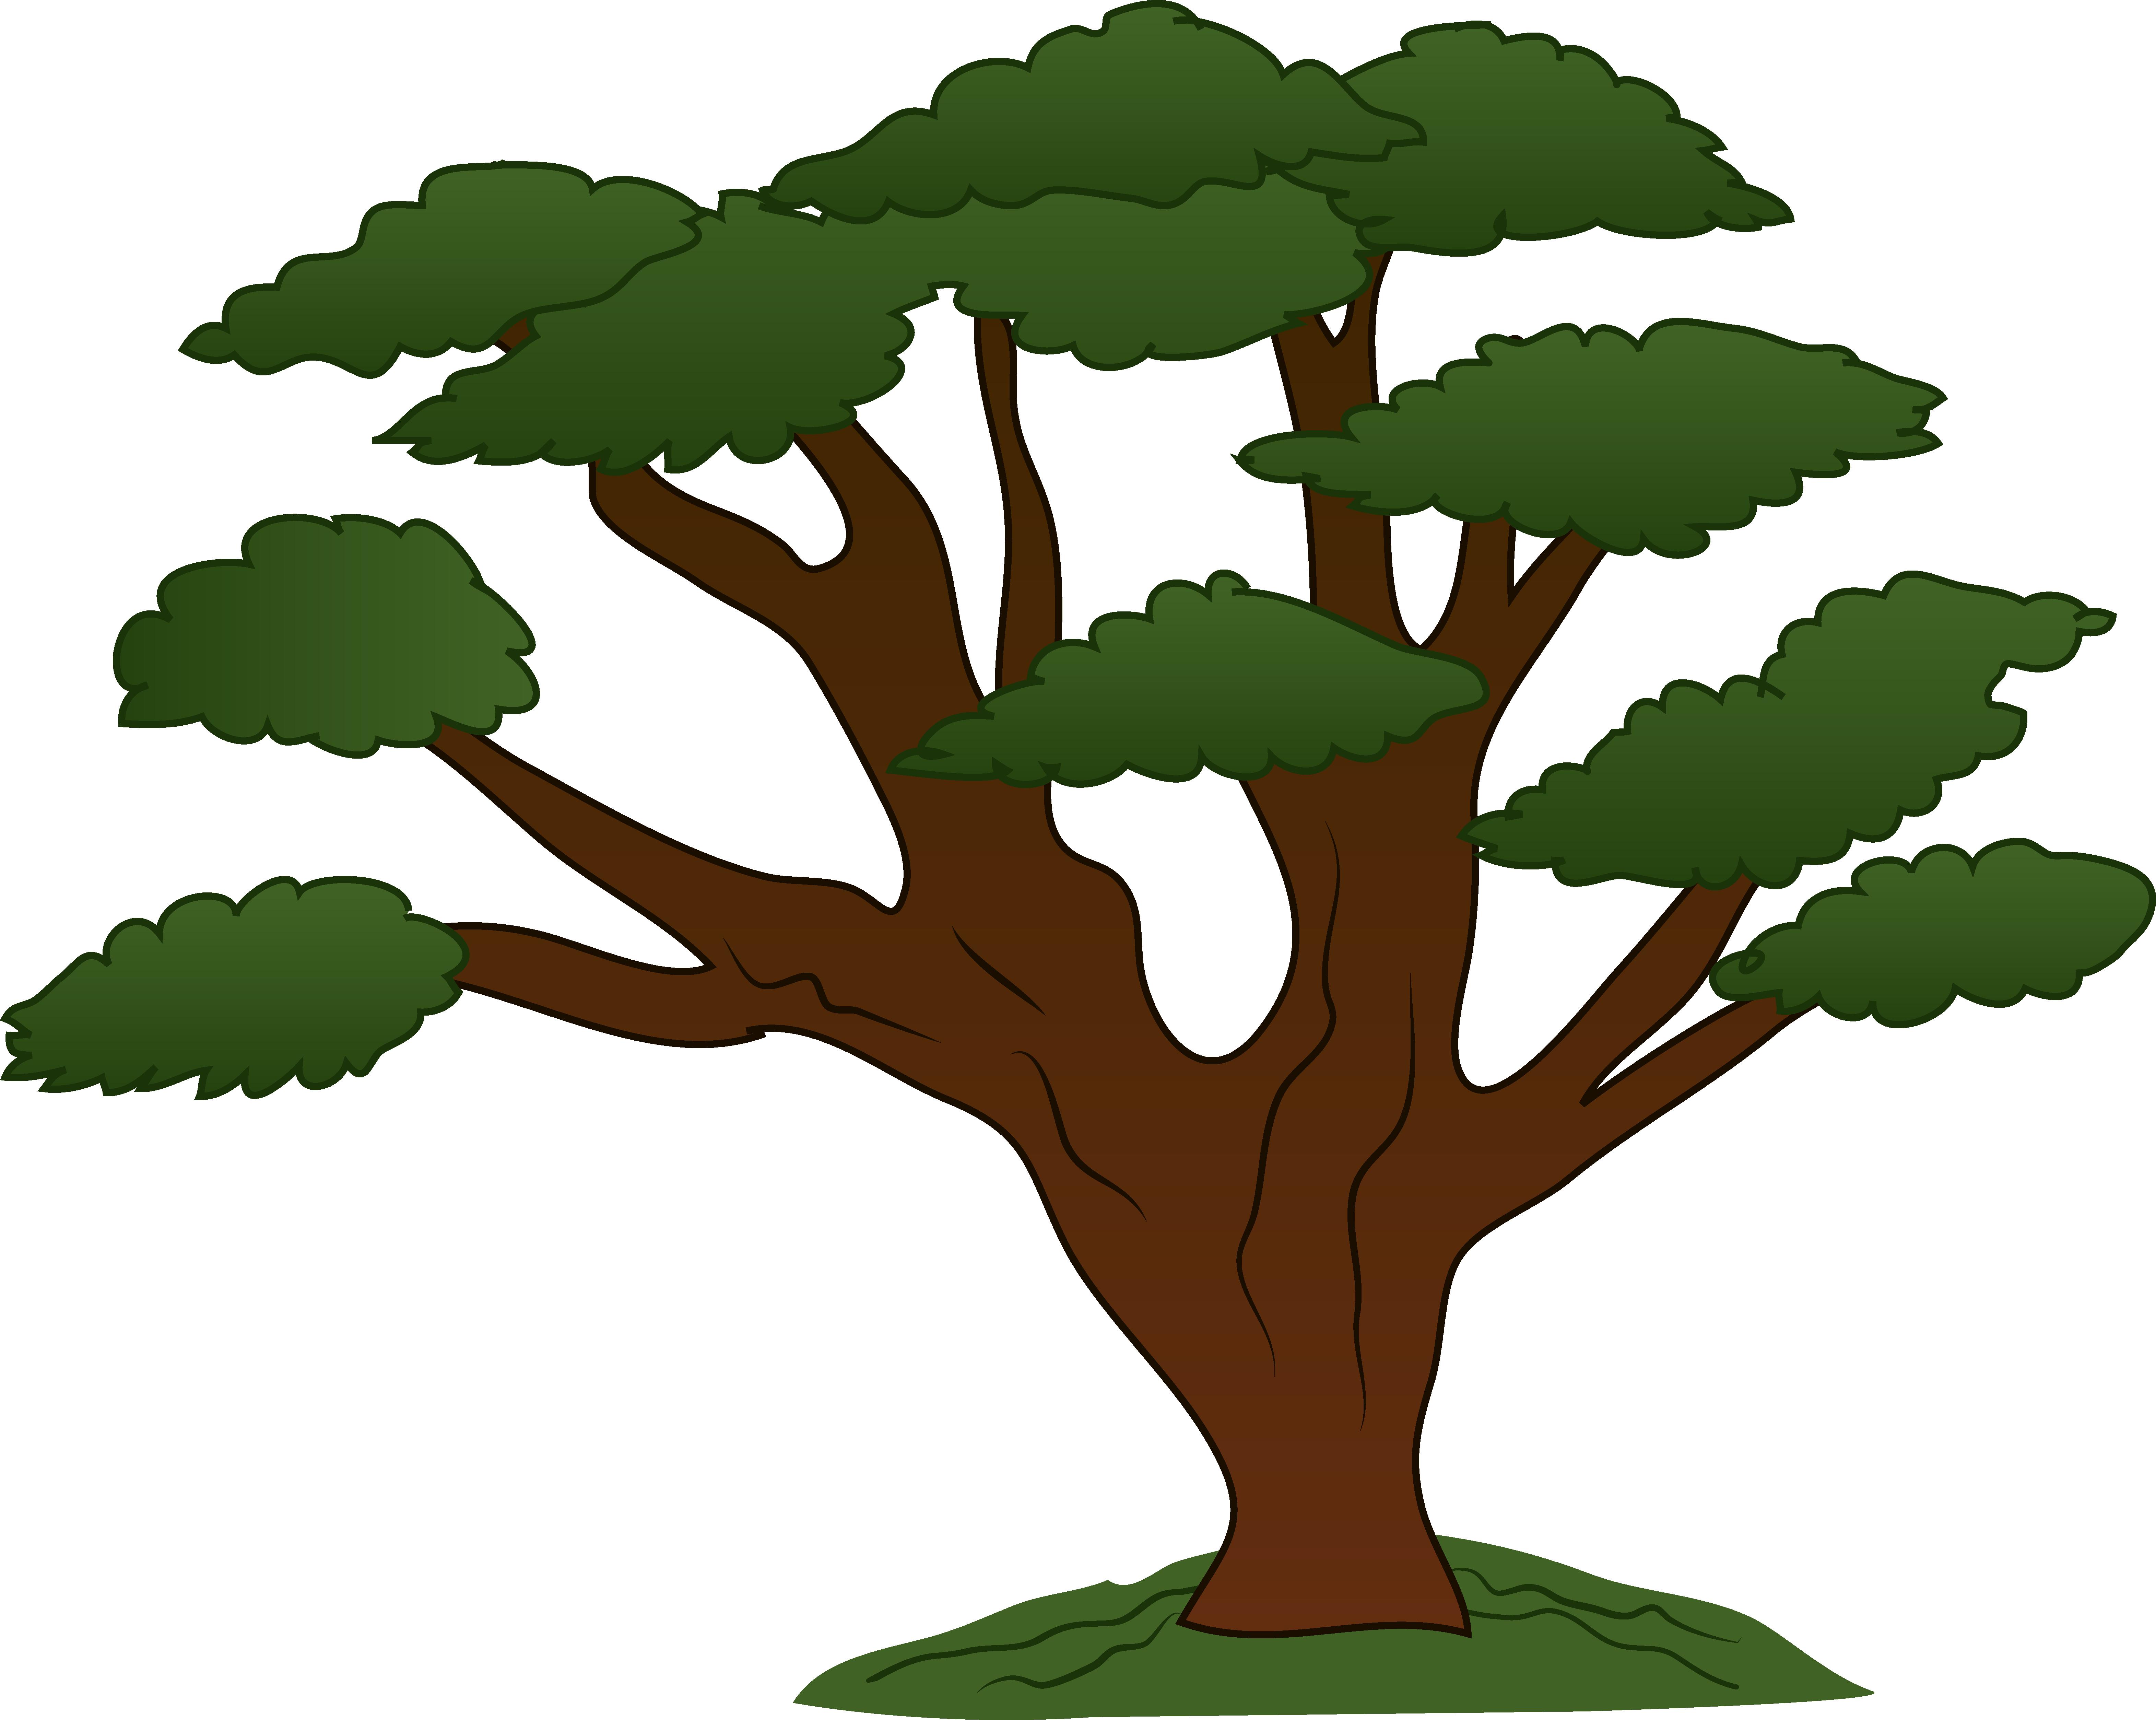 Tree Clip Art Oak Tree Clip Art Design Clip Art Tree Cartoon Images Clip Art Vintage